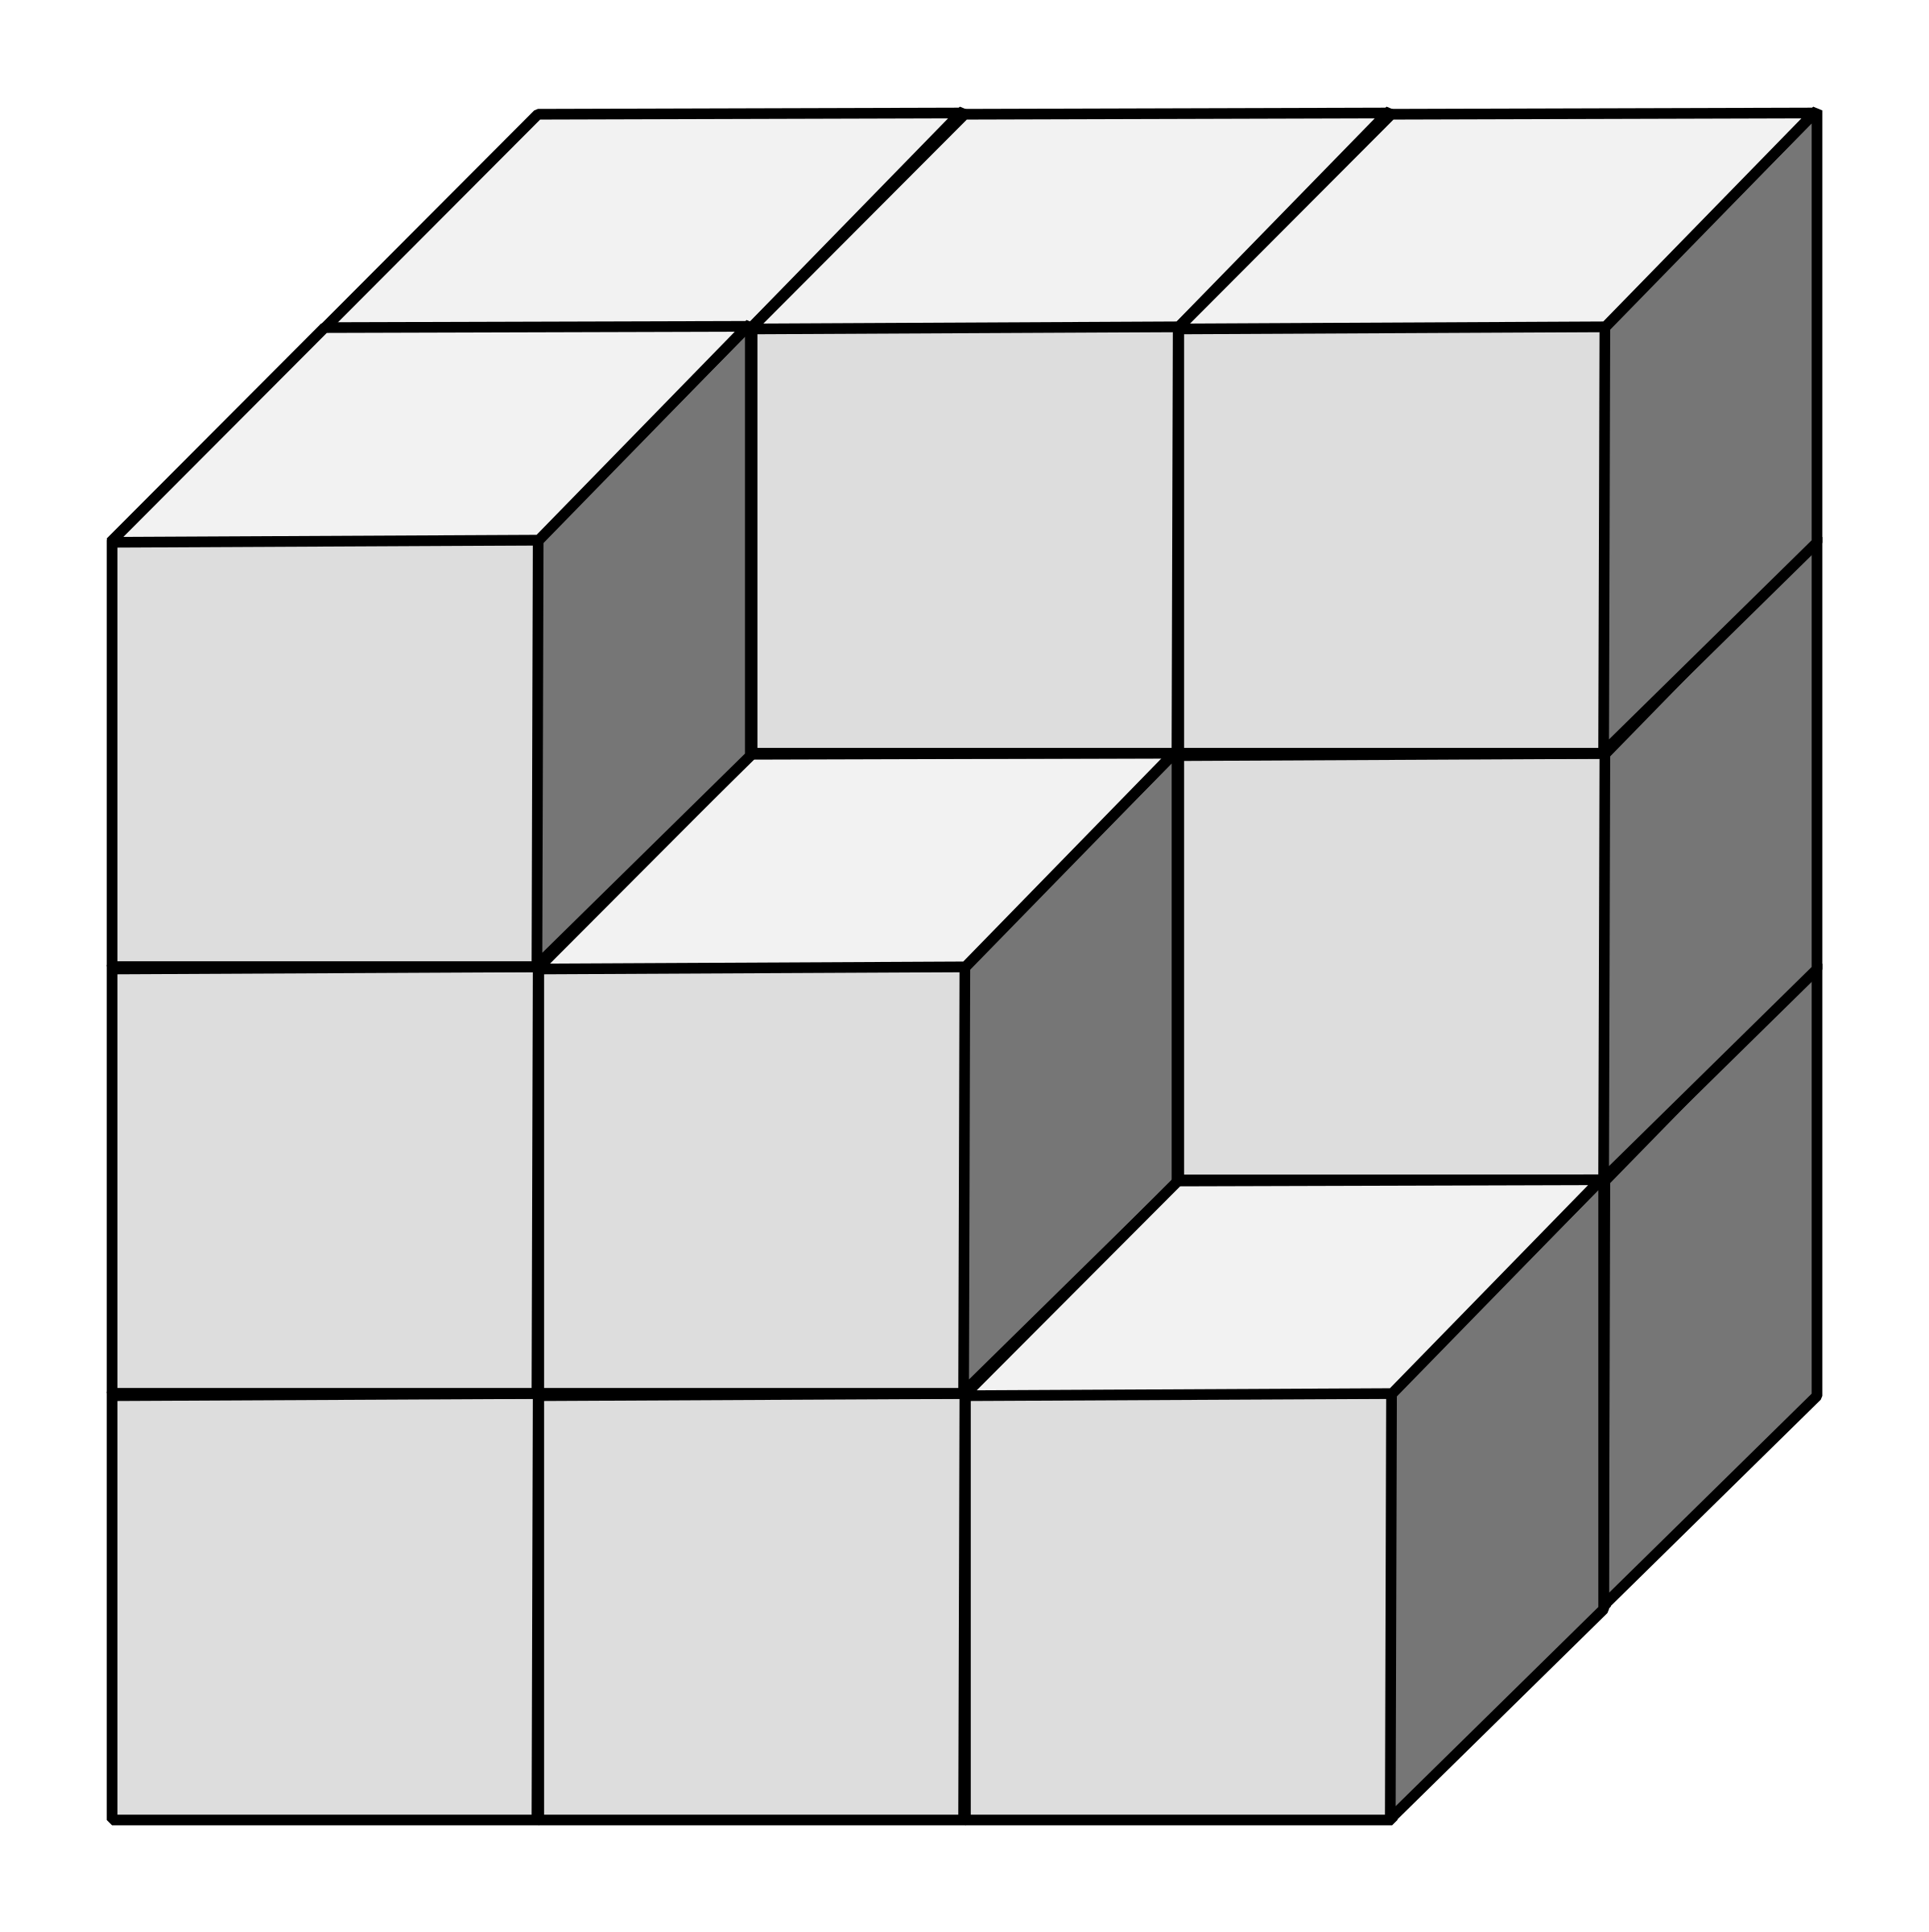 Square clipart dice. Isometric building big image